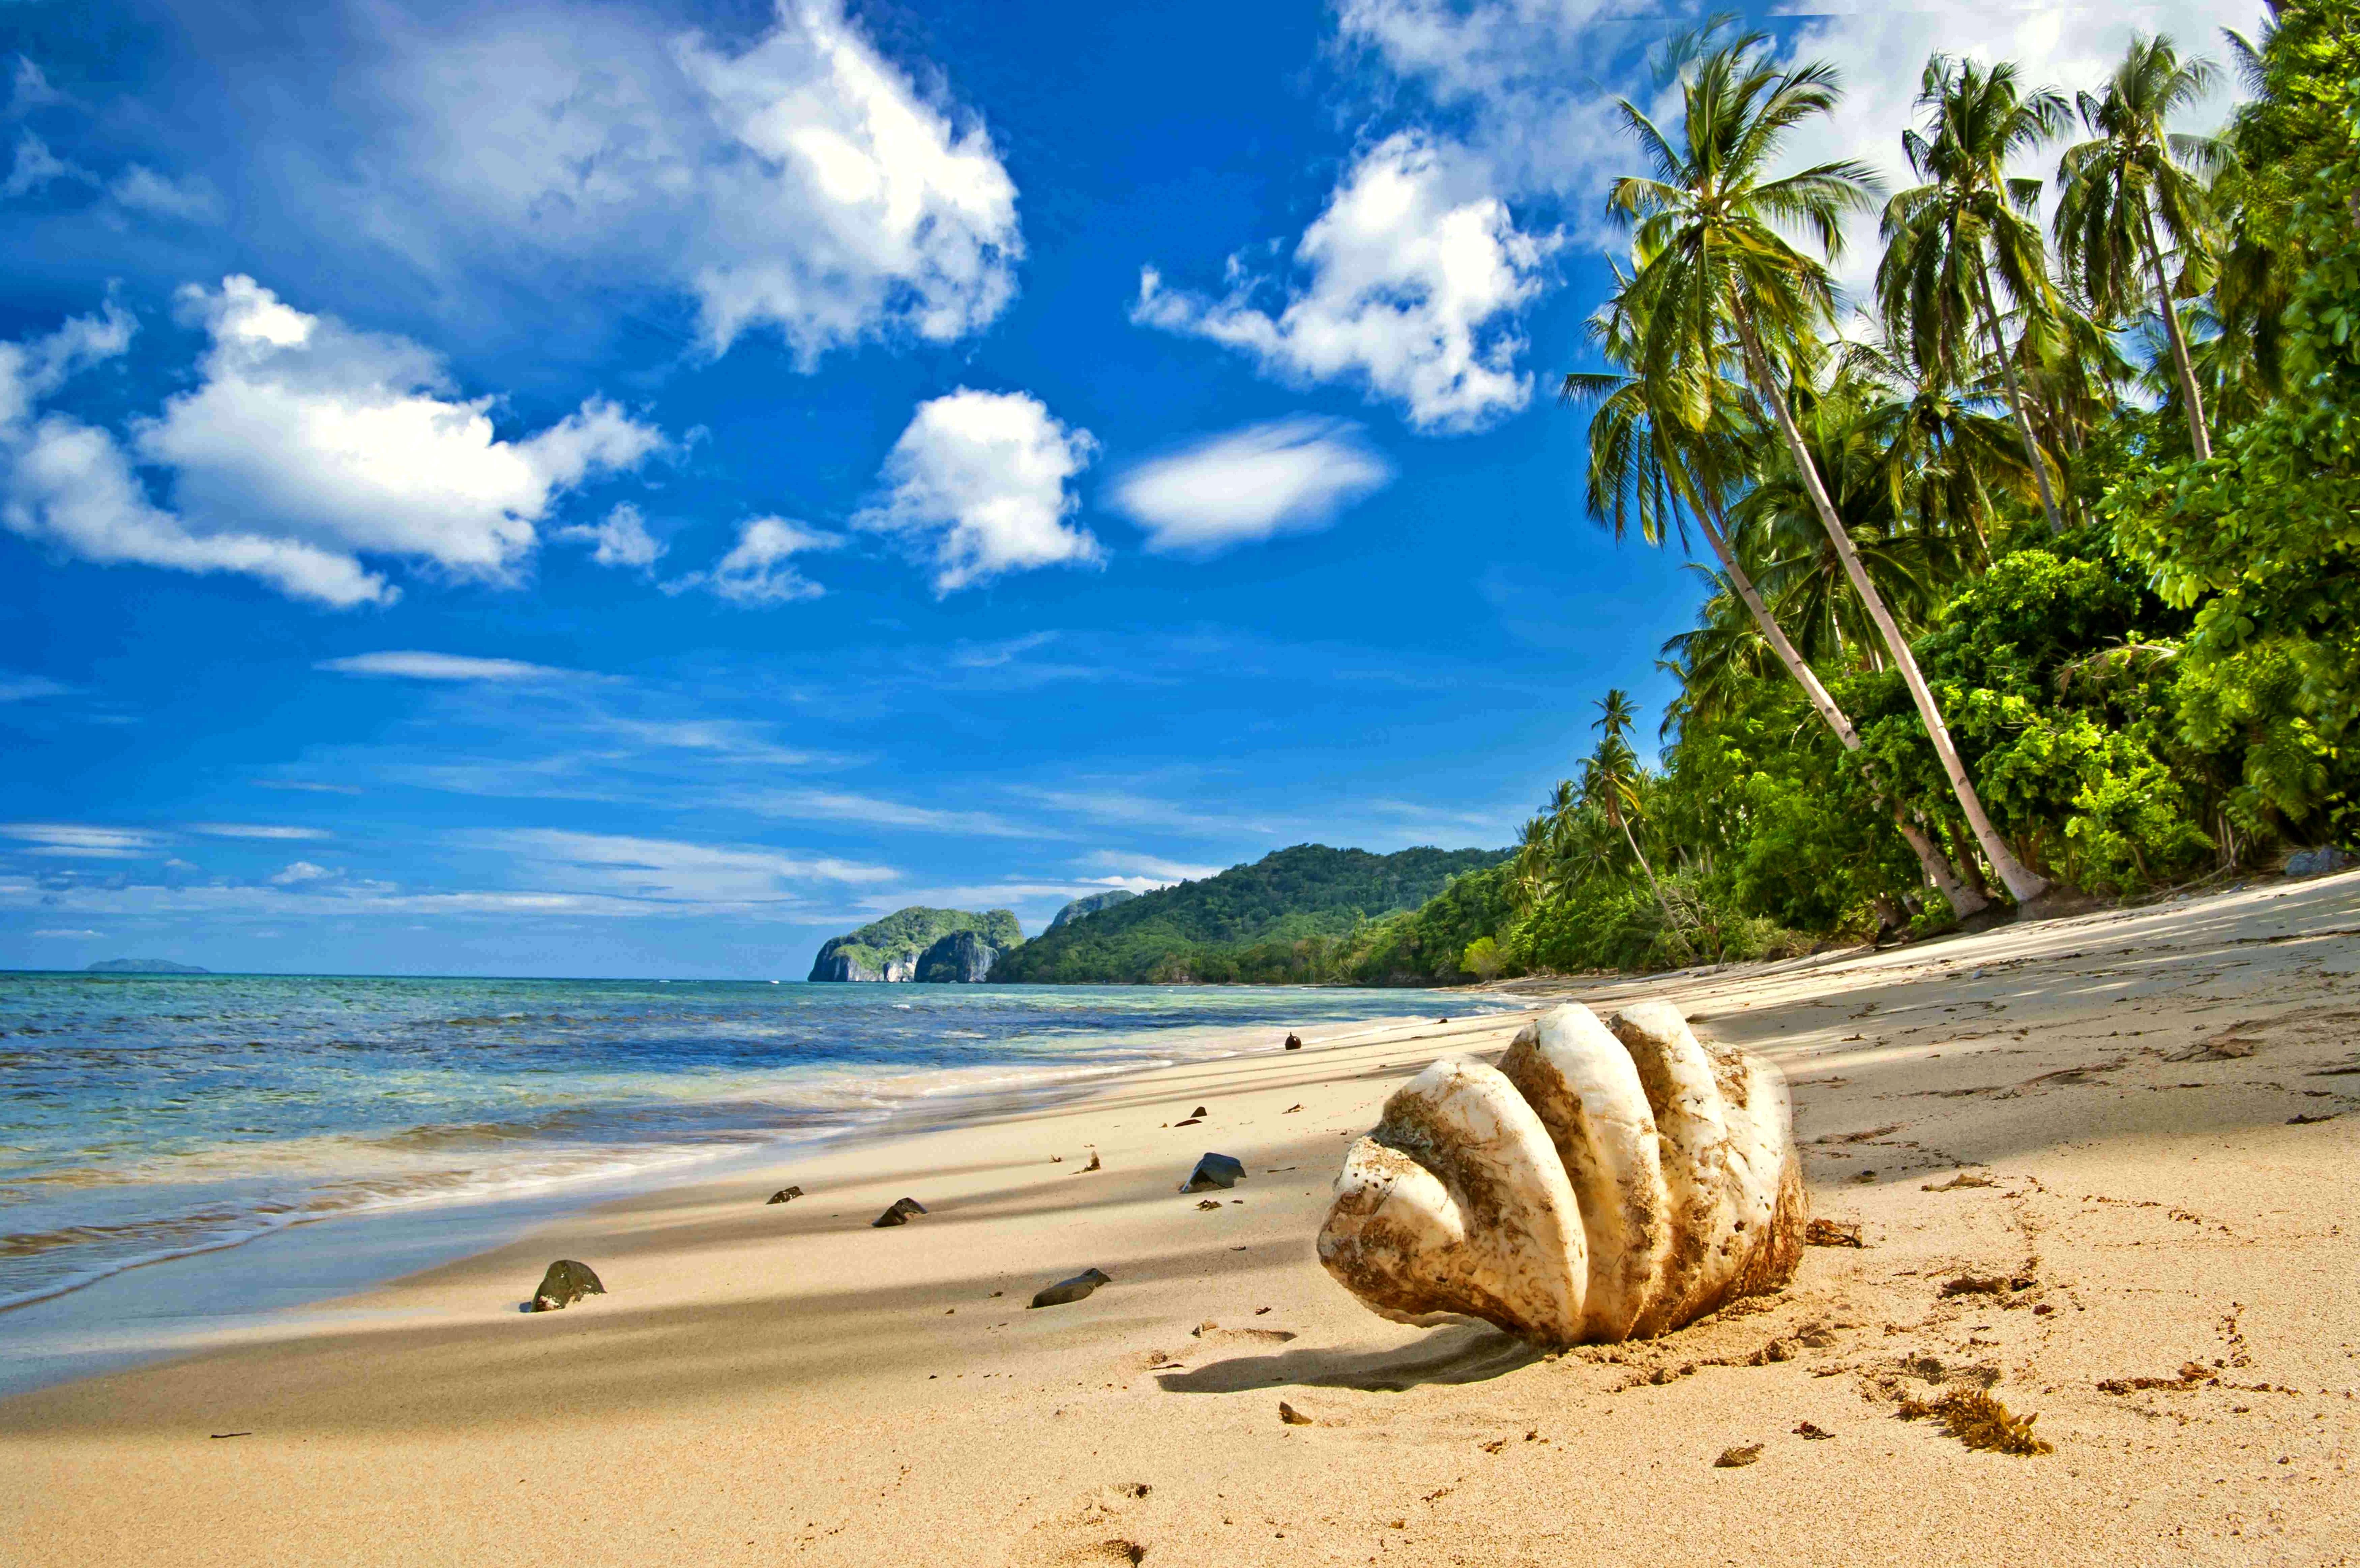 Tropical relax, bed, tree, summer обои скачать